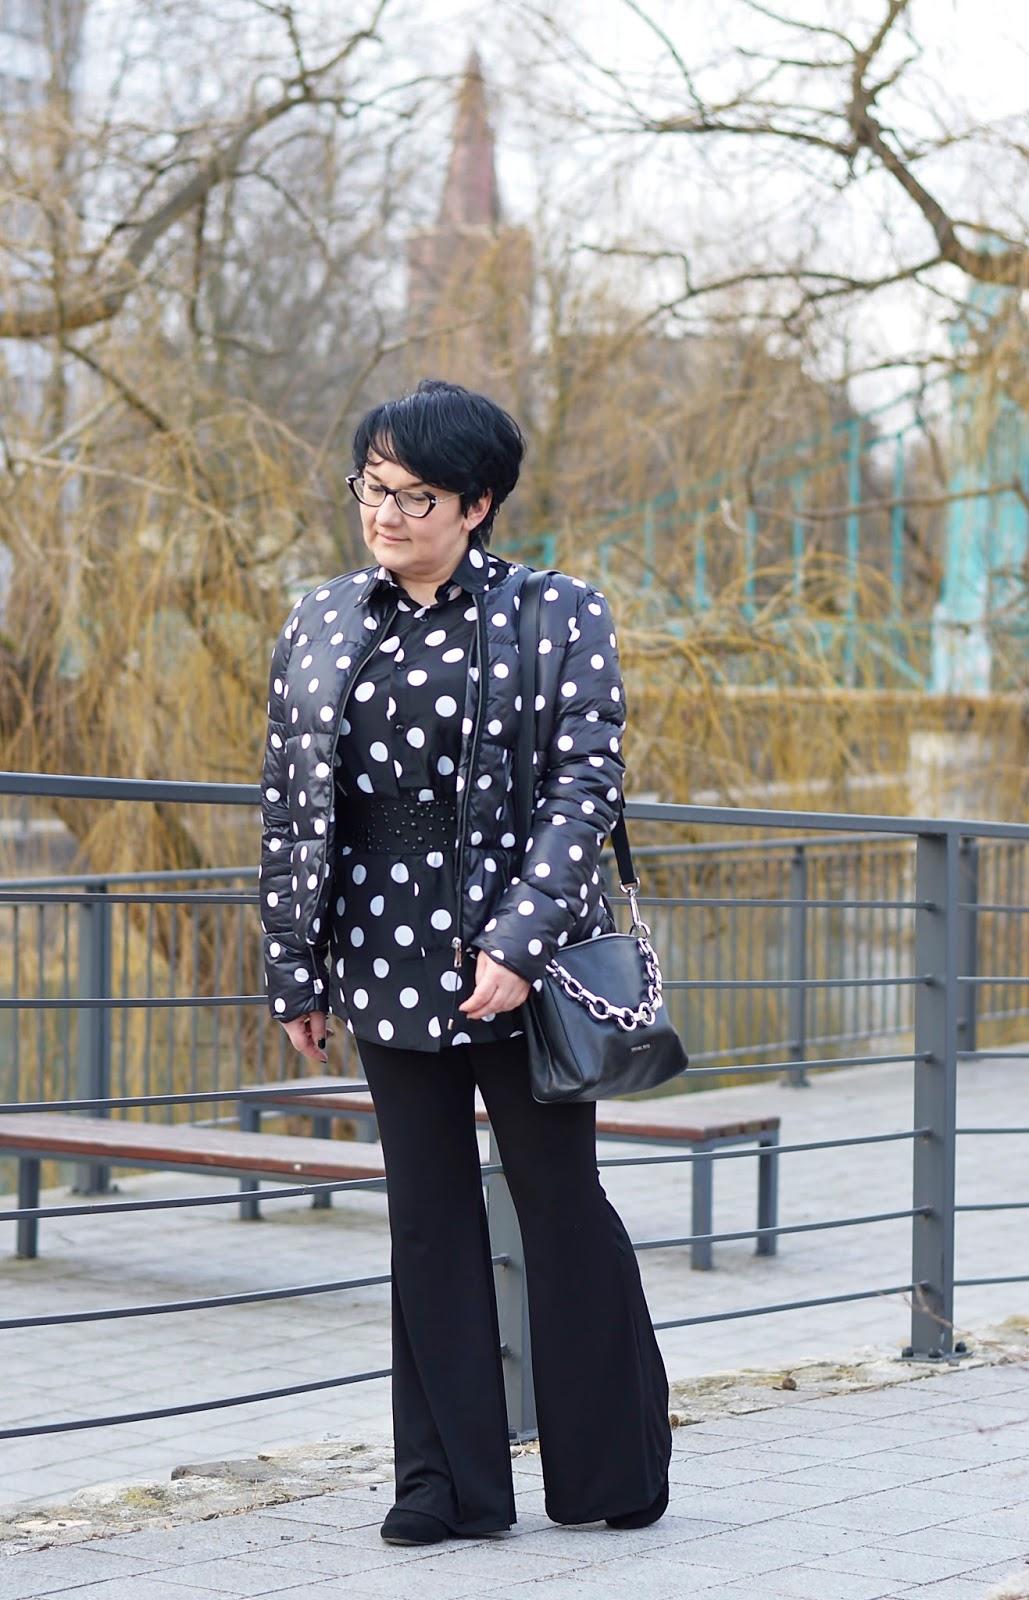 Lekka kurka w grochy, black and white style, polka dots